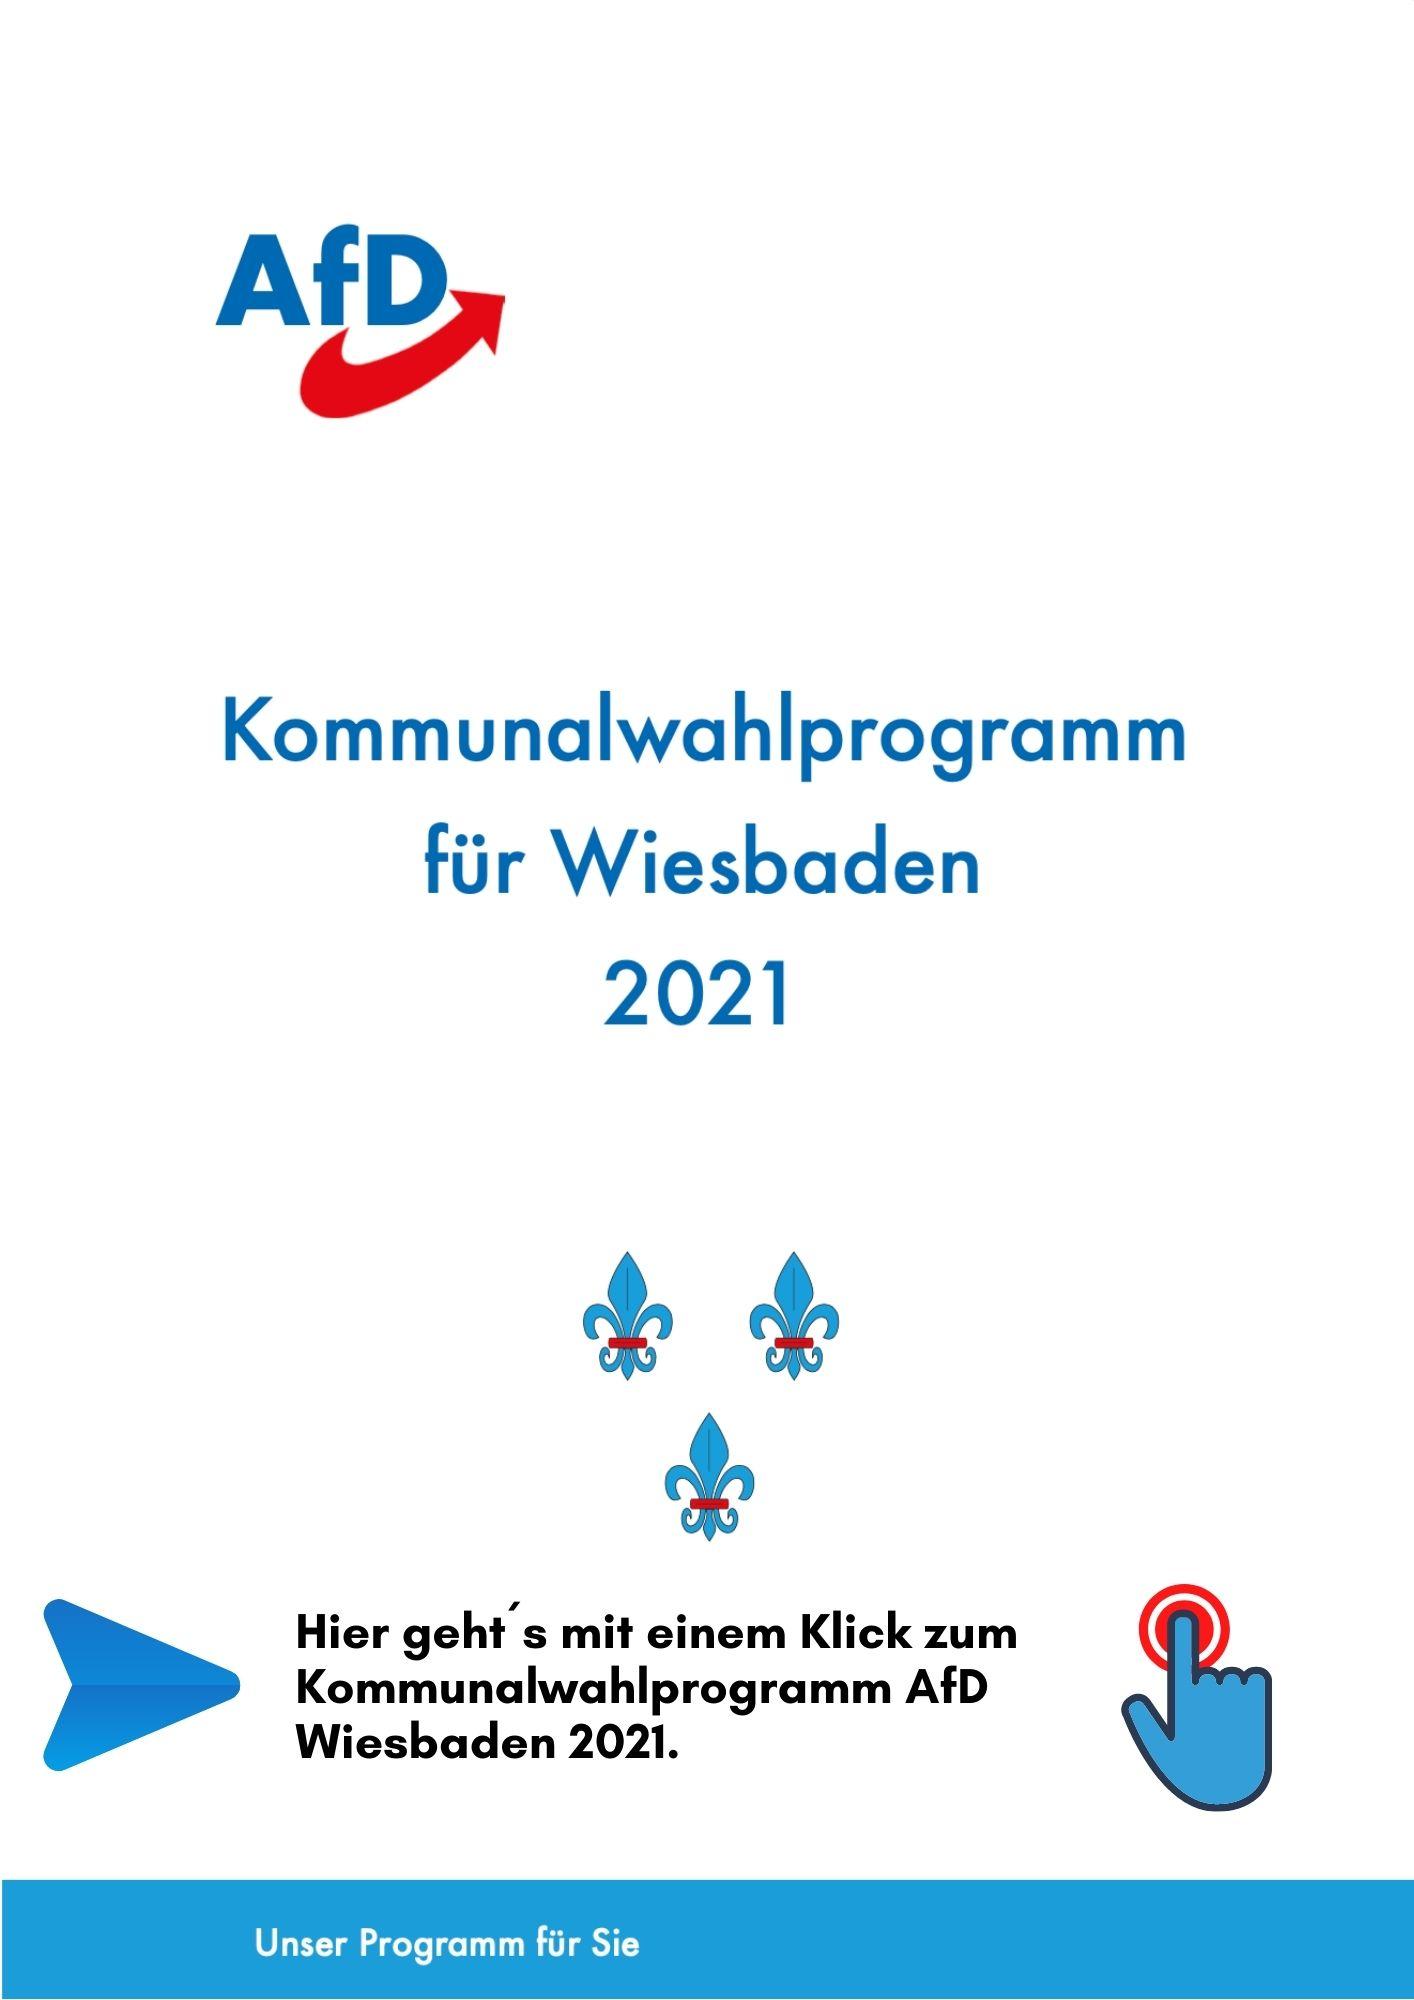 Kommunalwahlprogramm AfD Wiesbaden 2021